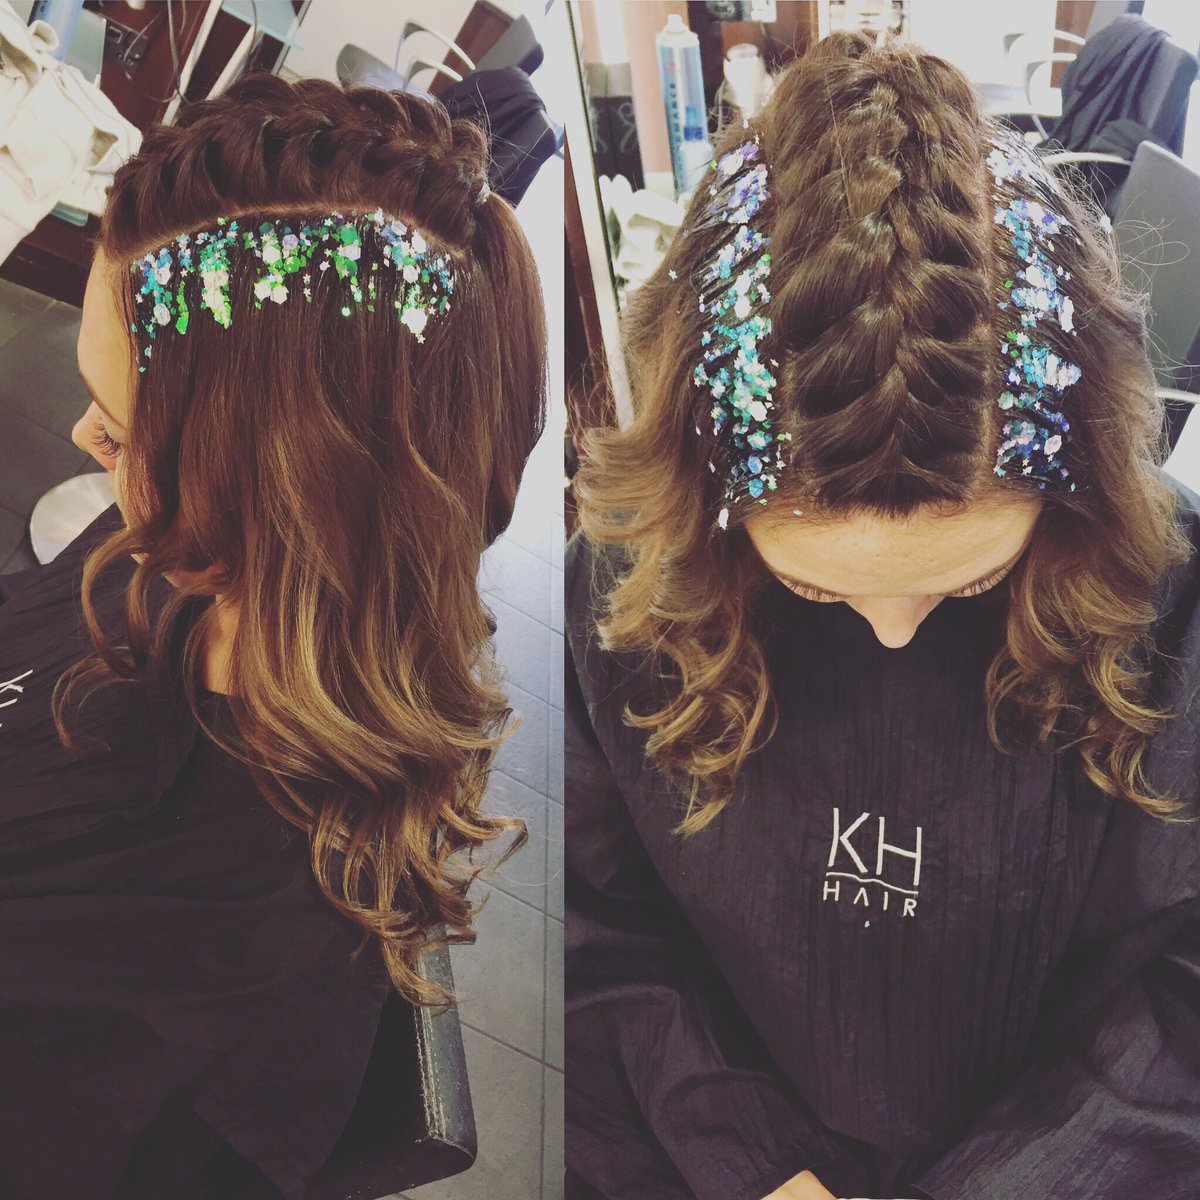 Braids &amp; Glitter by stylist Chloe @WellaEducation @WellaPro @thegypsyshrine #festivalready <br>http://pic.twitter.com/rt6shUgNkr